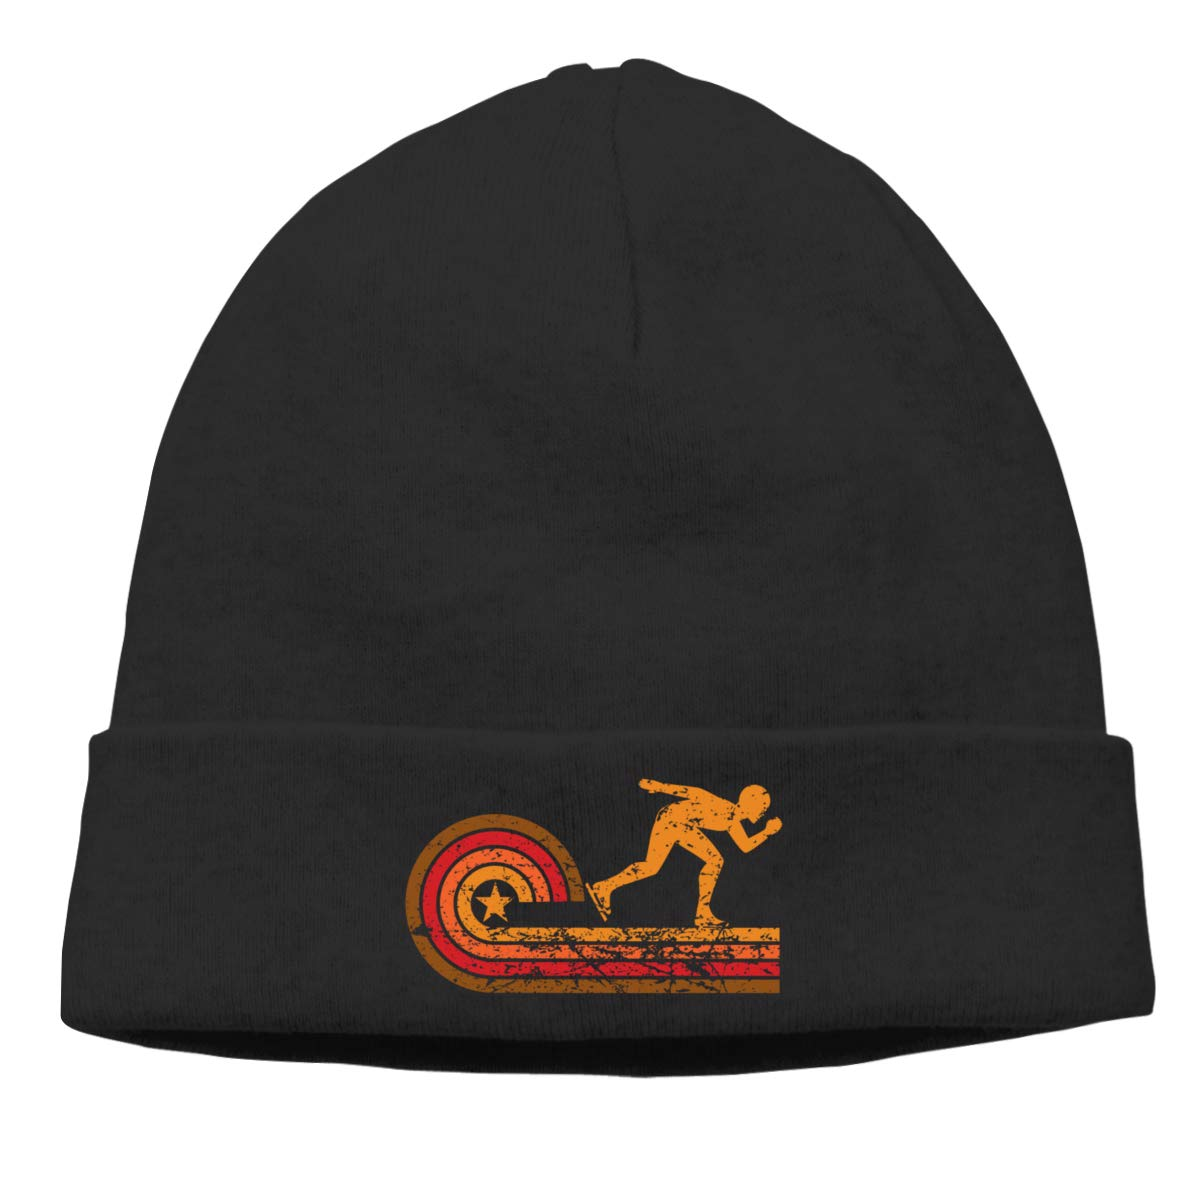 Riokk az Retro Style Speed Skating Skull Hat Beanie Cap for Mens Black